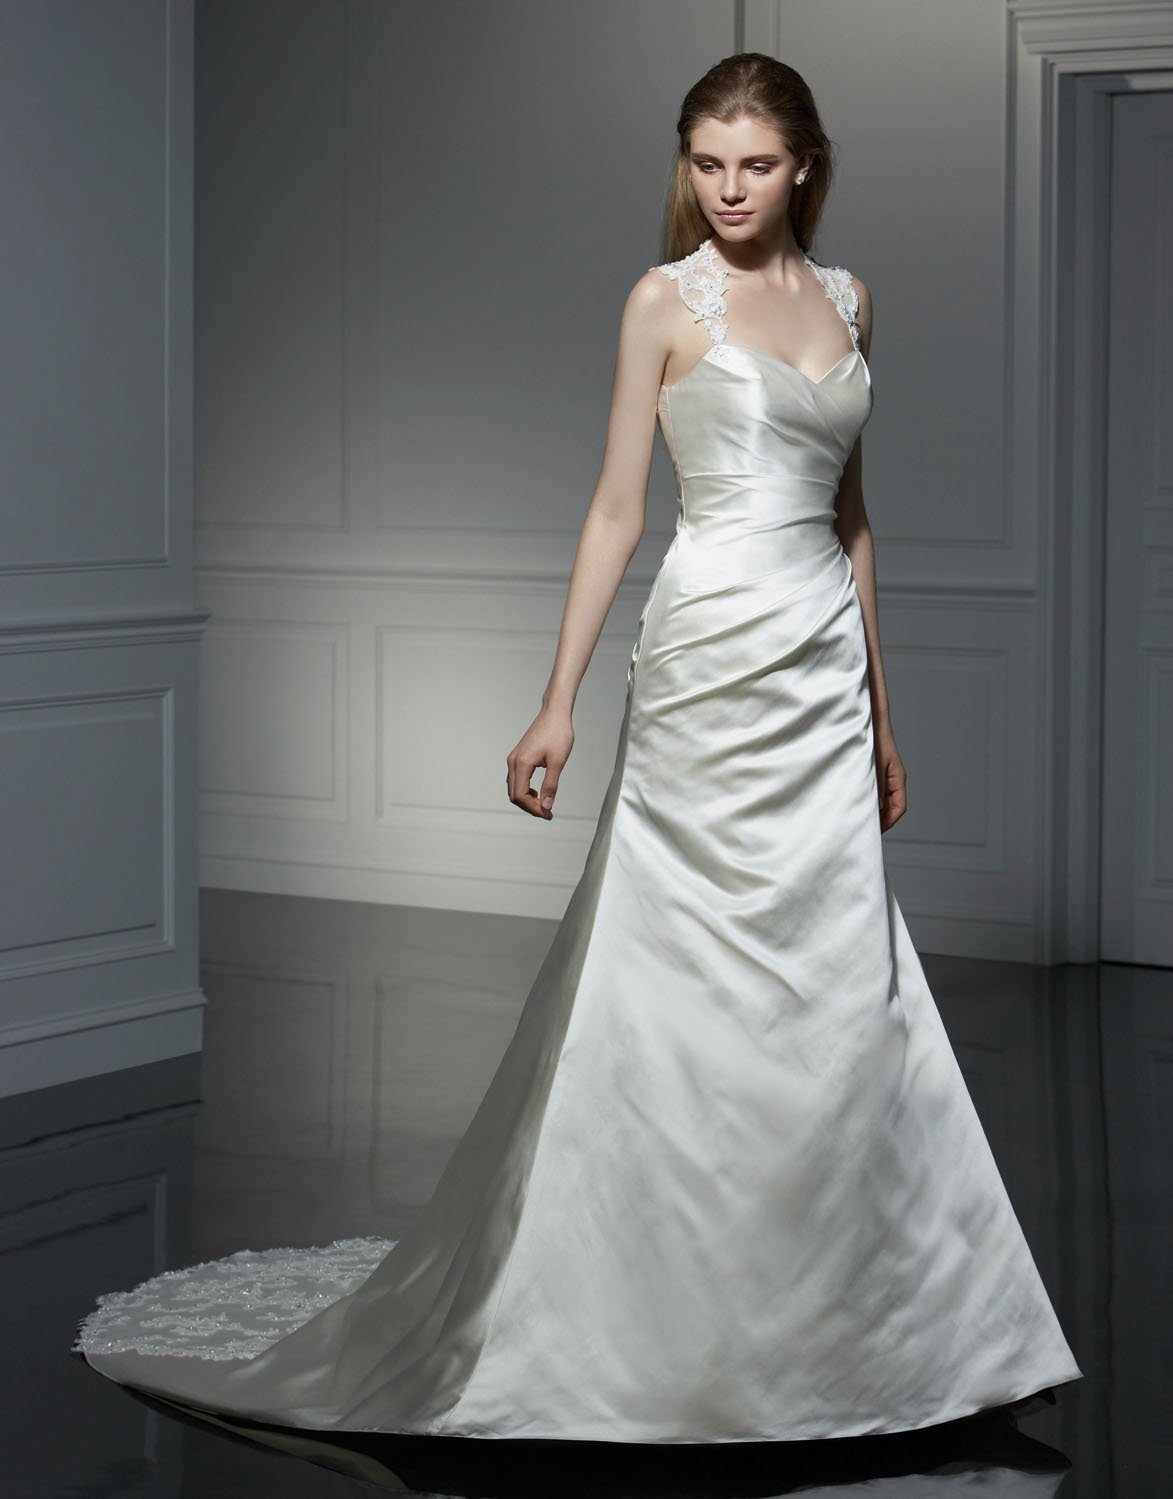 Sexy A-line V-neckline Appliqued Beading Taffeta Wedding Dress Bridal Gown aq0035